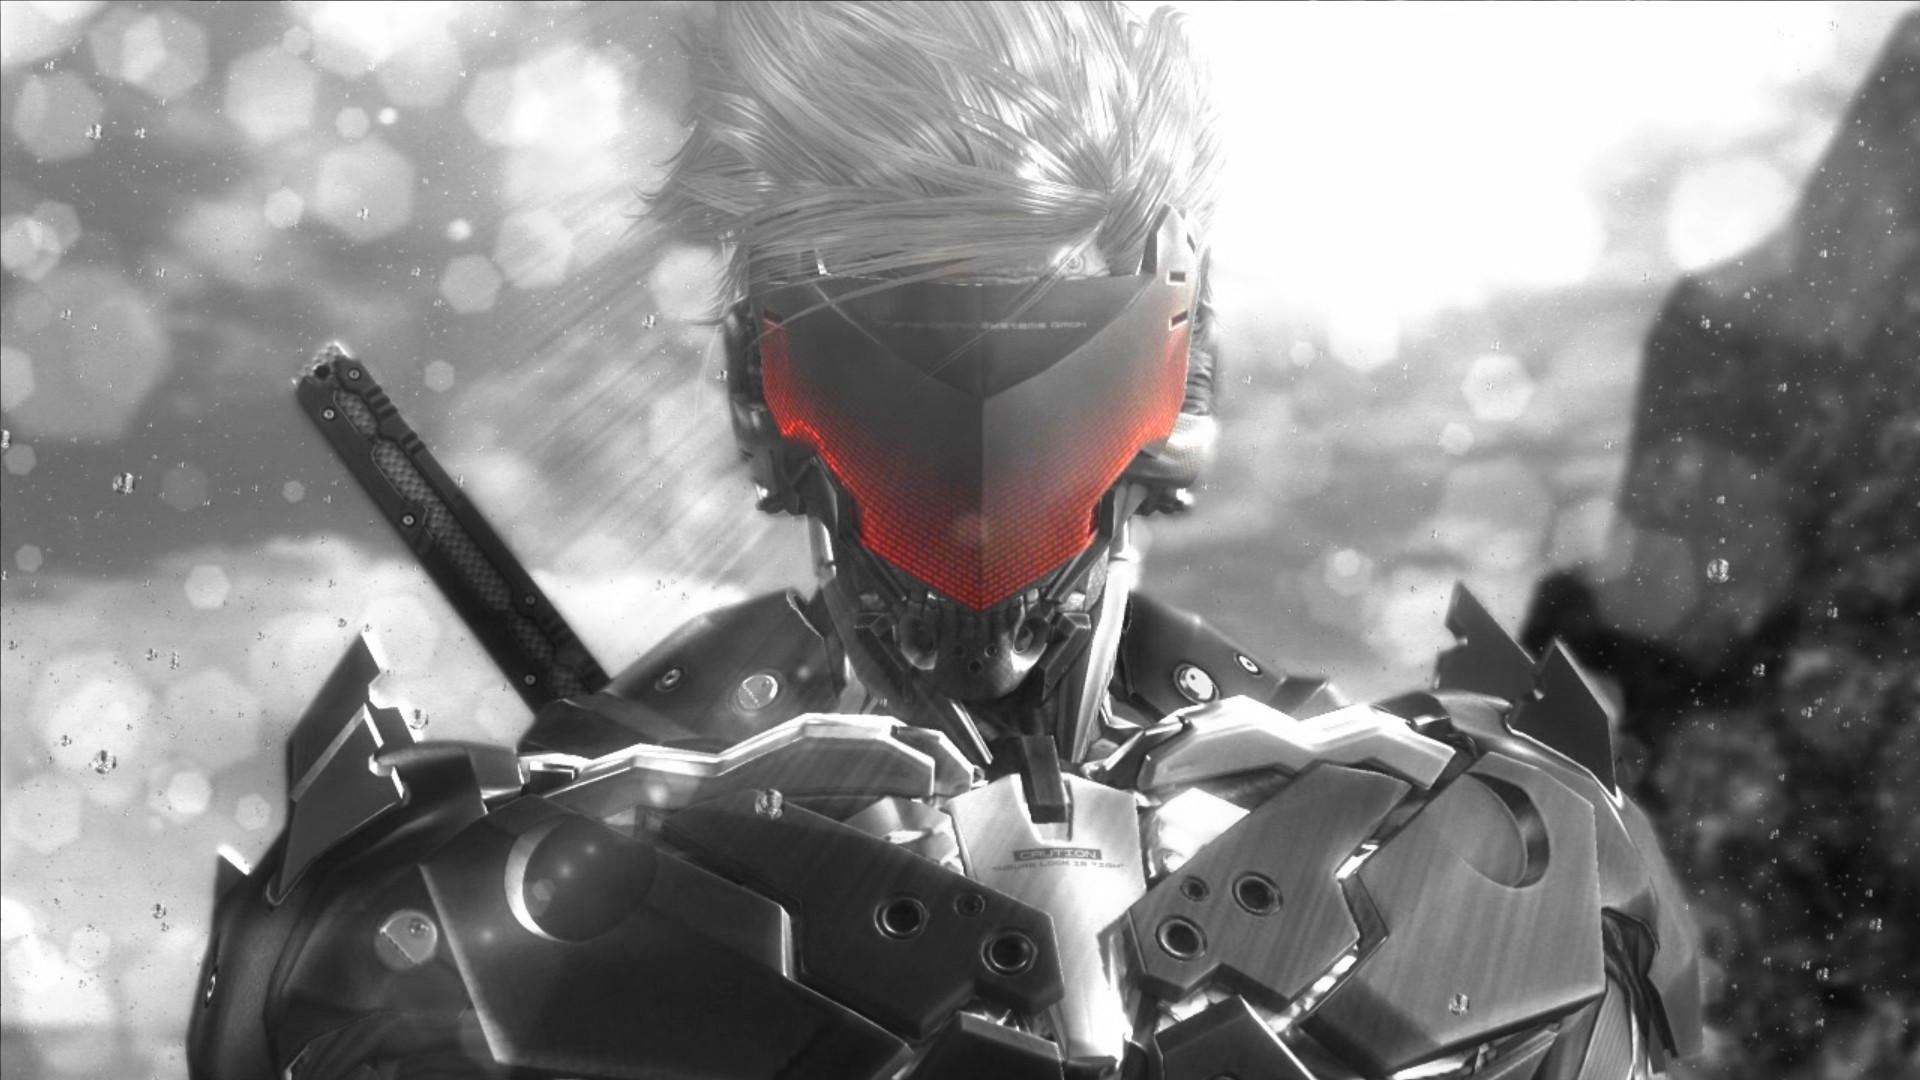 General 1920x1080 Metal Gear Rising: Revengeance Raiden ninja robots sword glowing monochrome cyborg